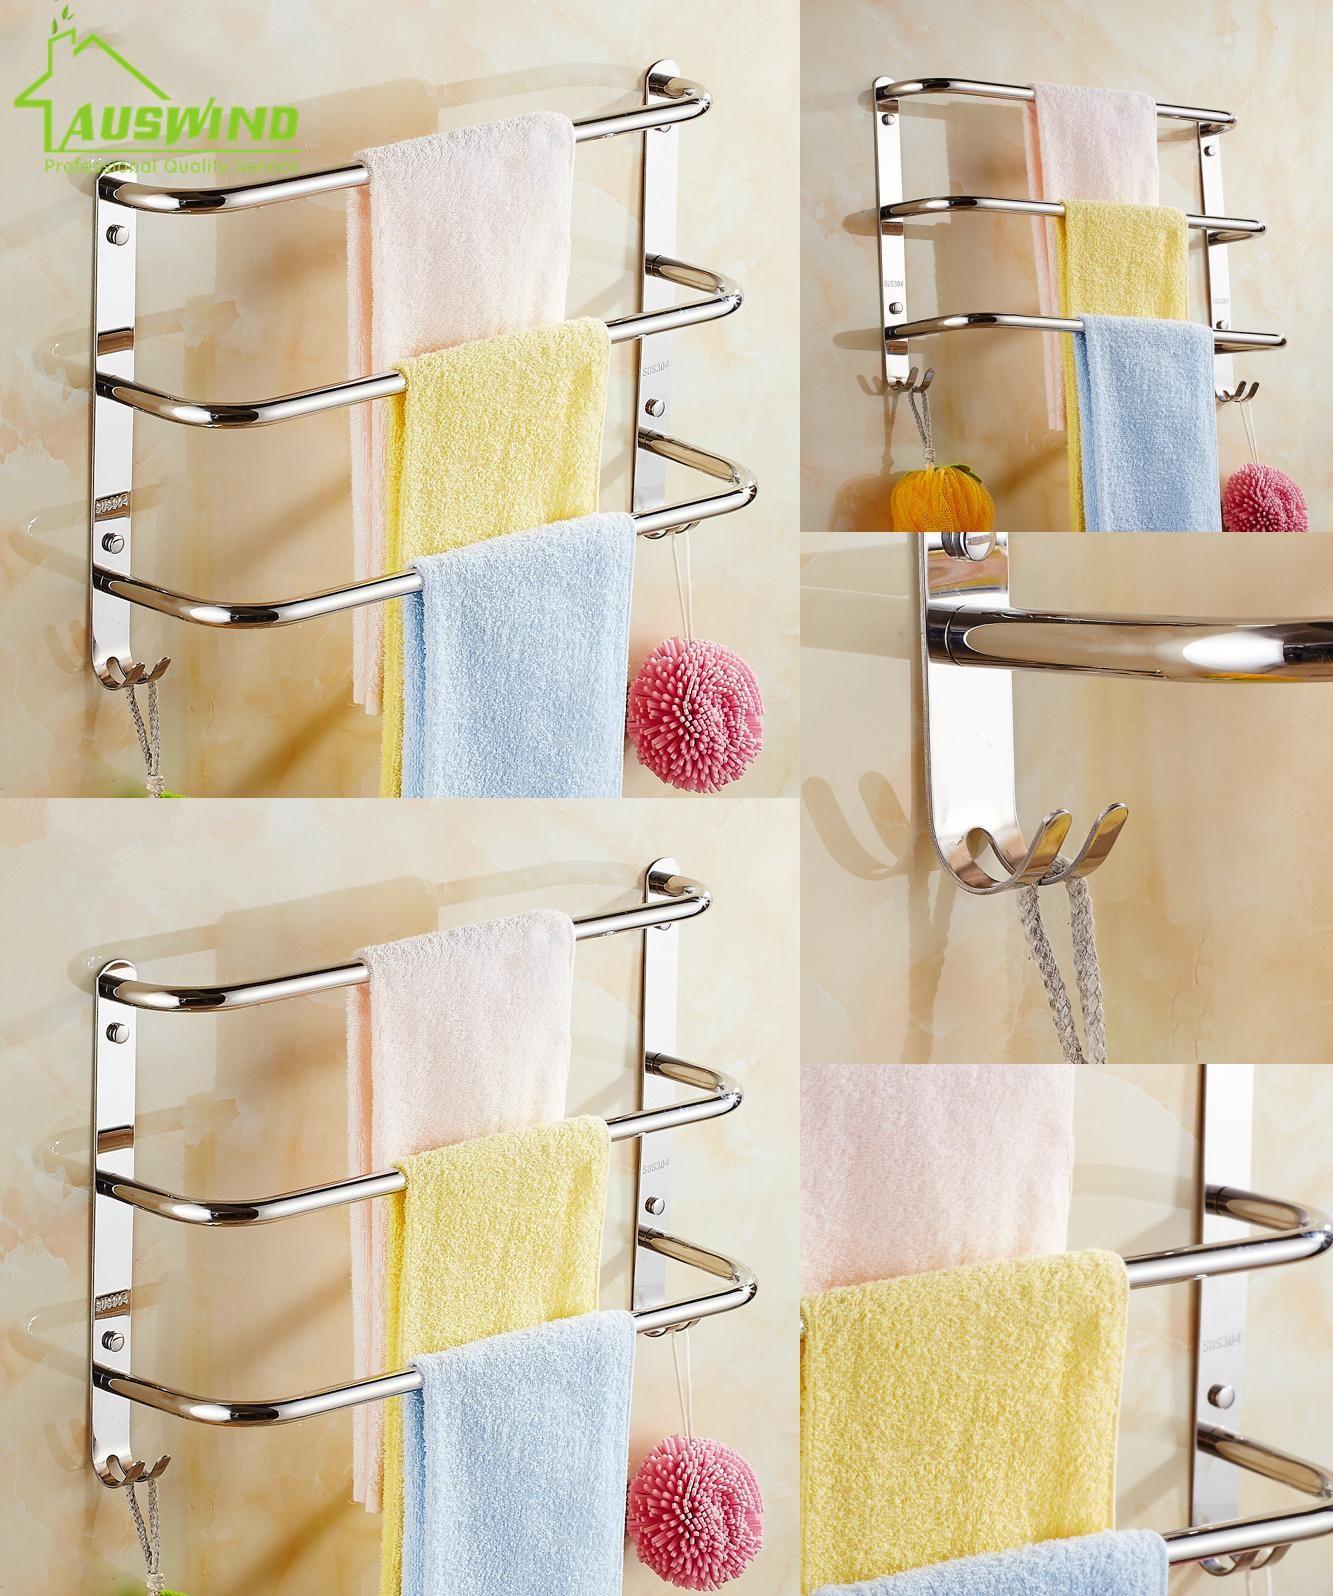 Bathroom wall mounted chrome brass towel rack shelf towel bar w hooks -  Visit To Buy Sus304 Stainless Steel Chrome Towel Bar 3 Layers Wall Mounted Towel